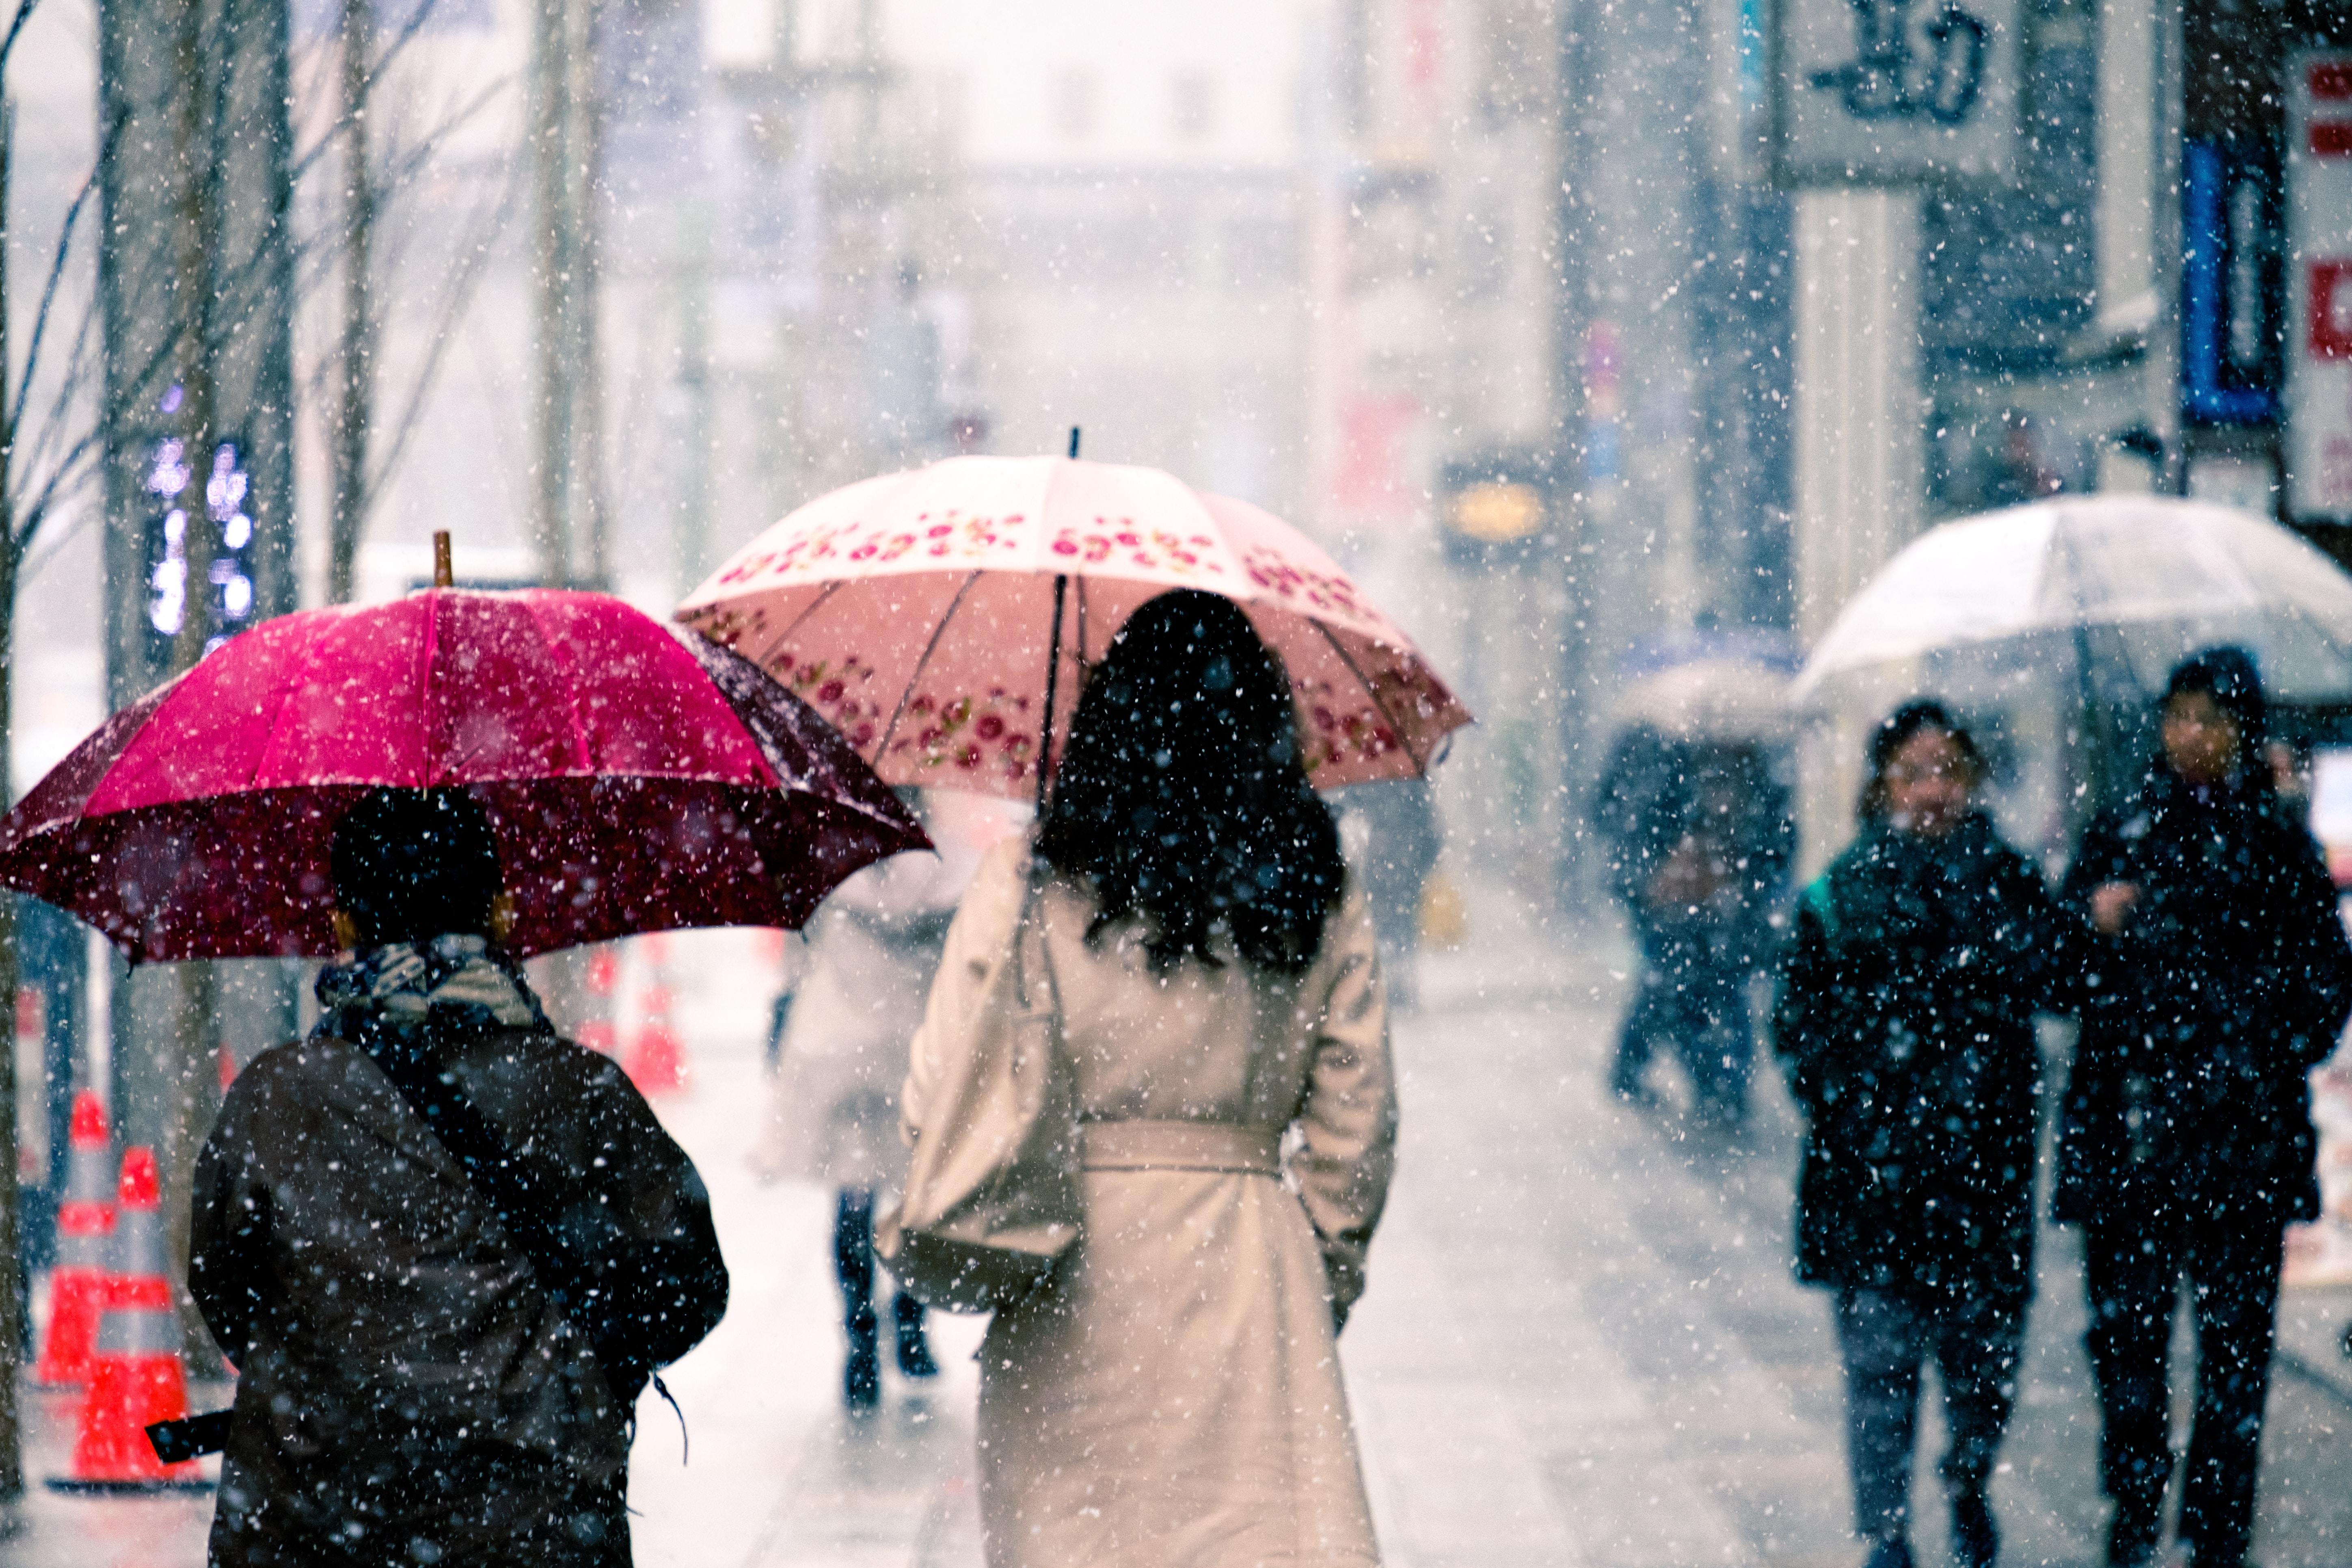 people walking on street under the rain